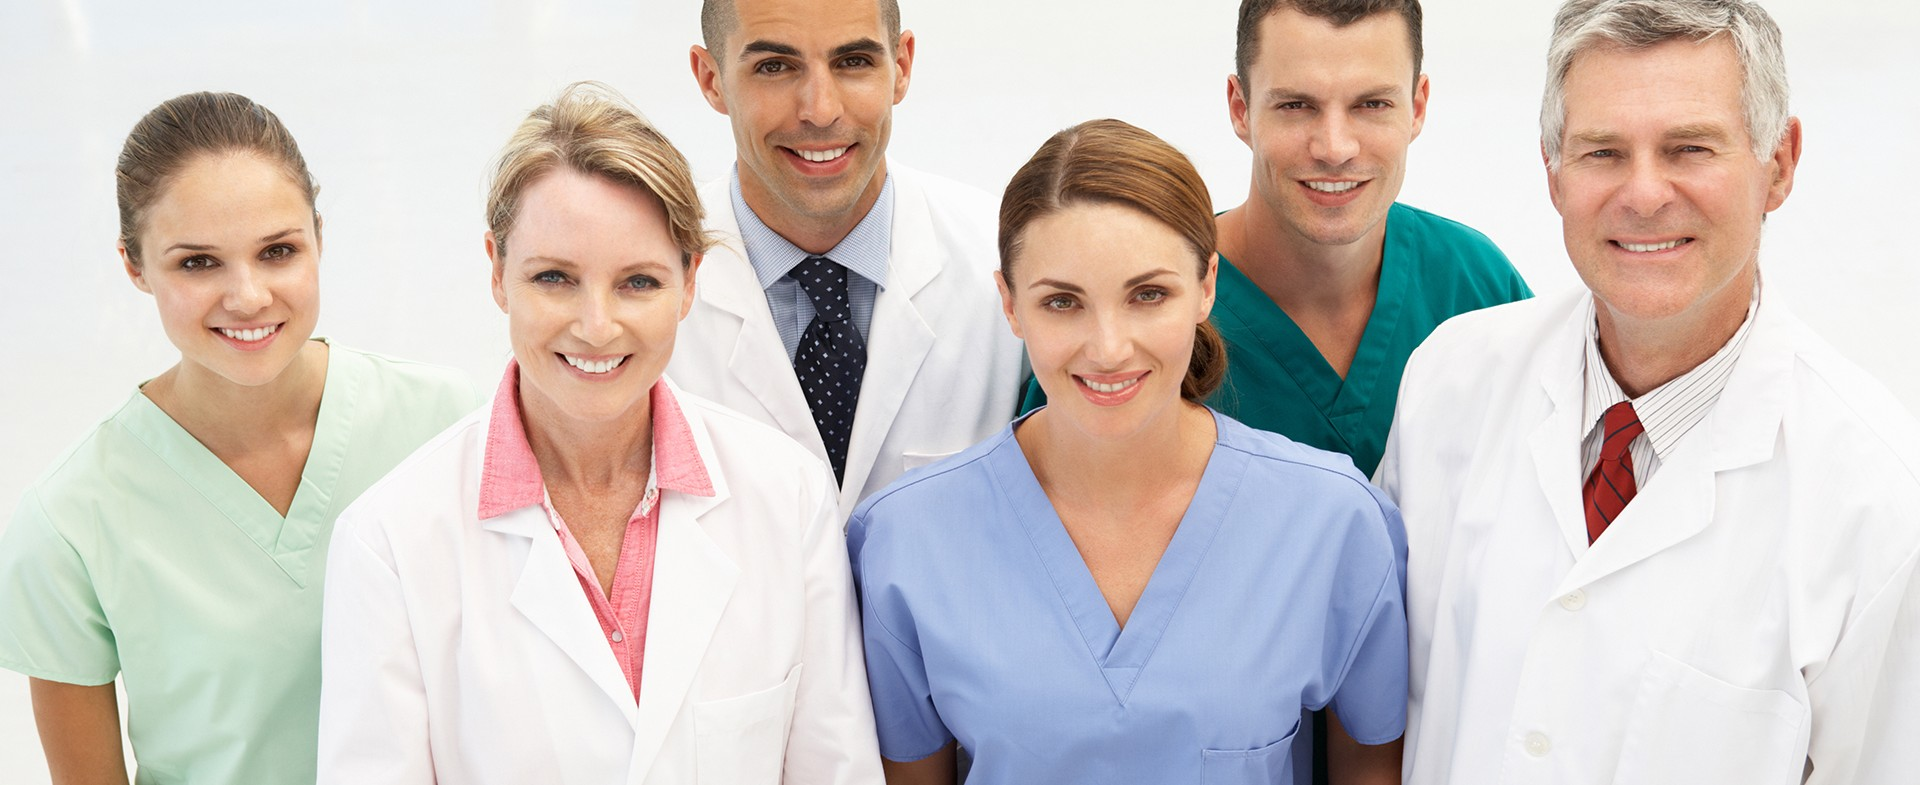 Healtcare professionals